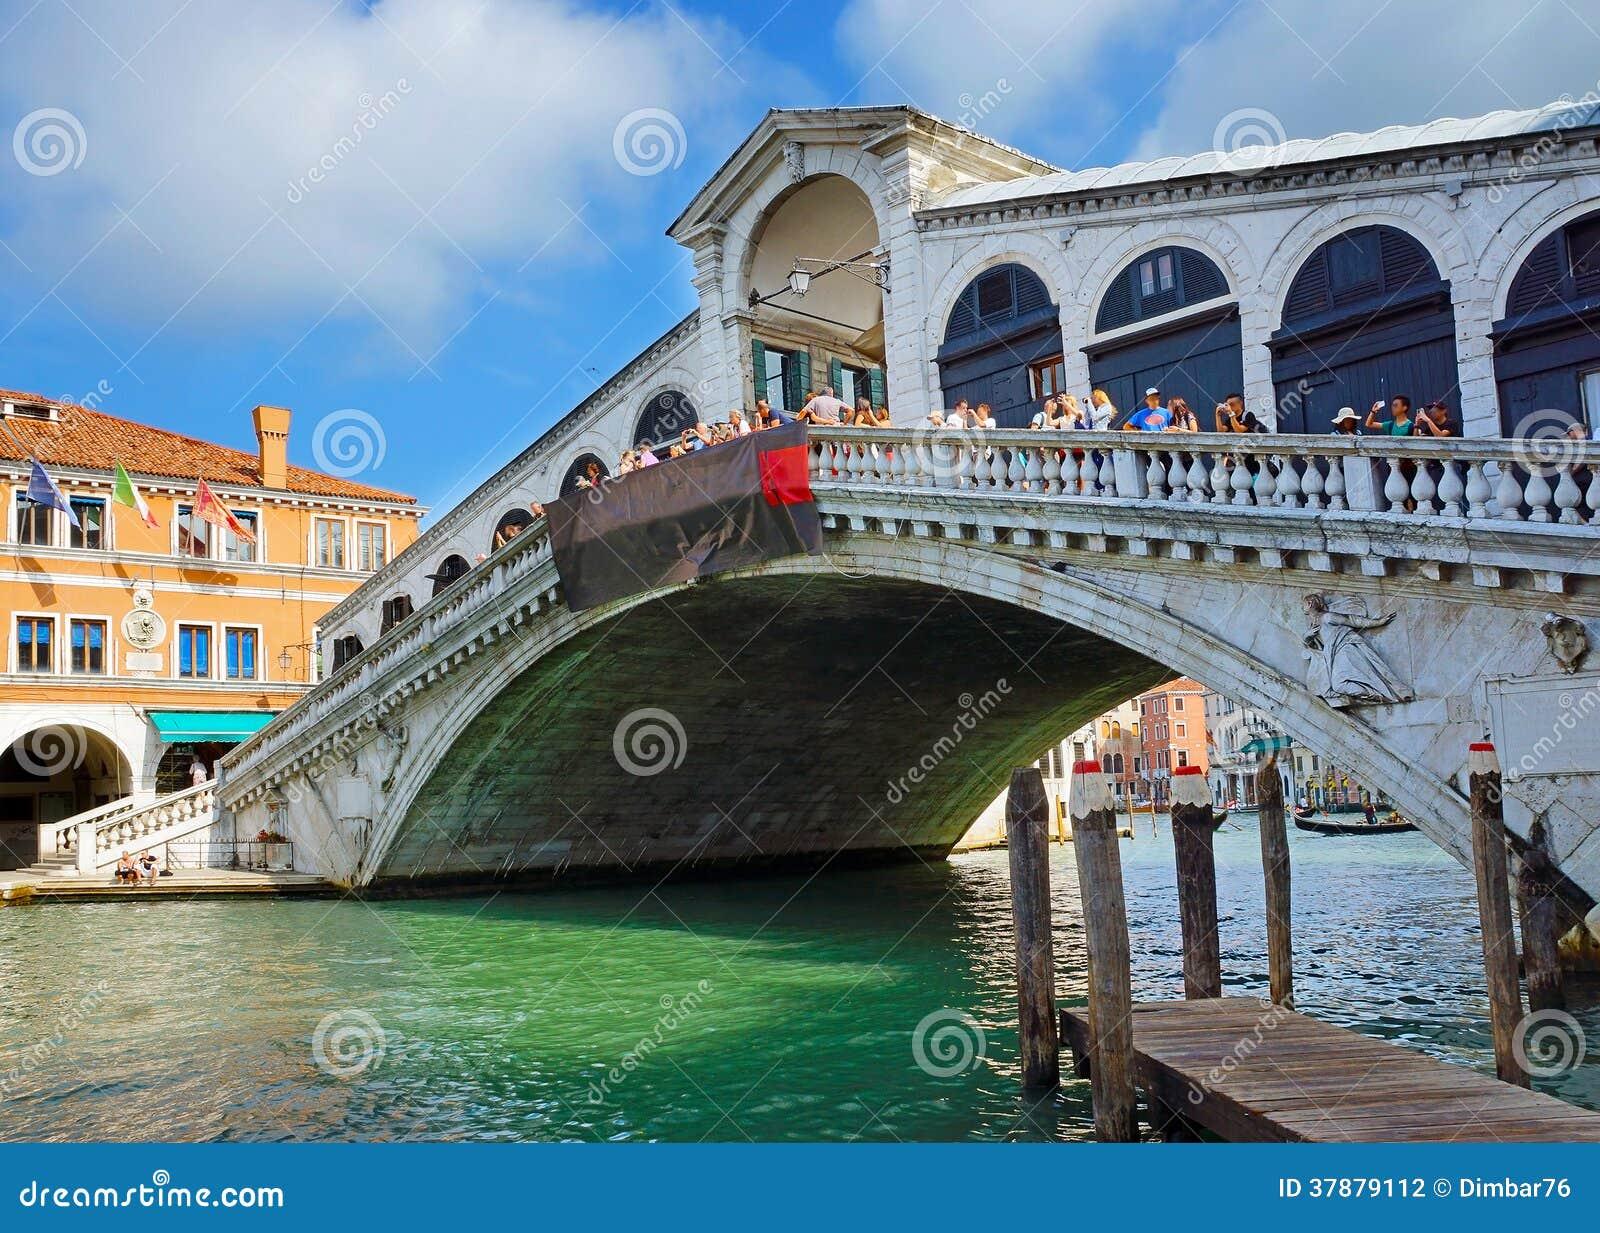 Beroemde Rialto-Brug in Venetië, Italië